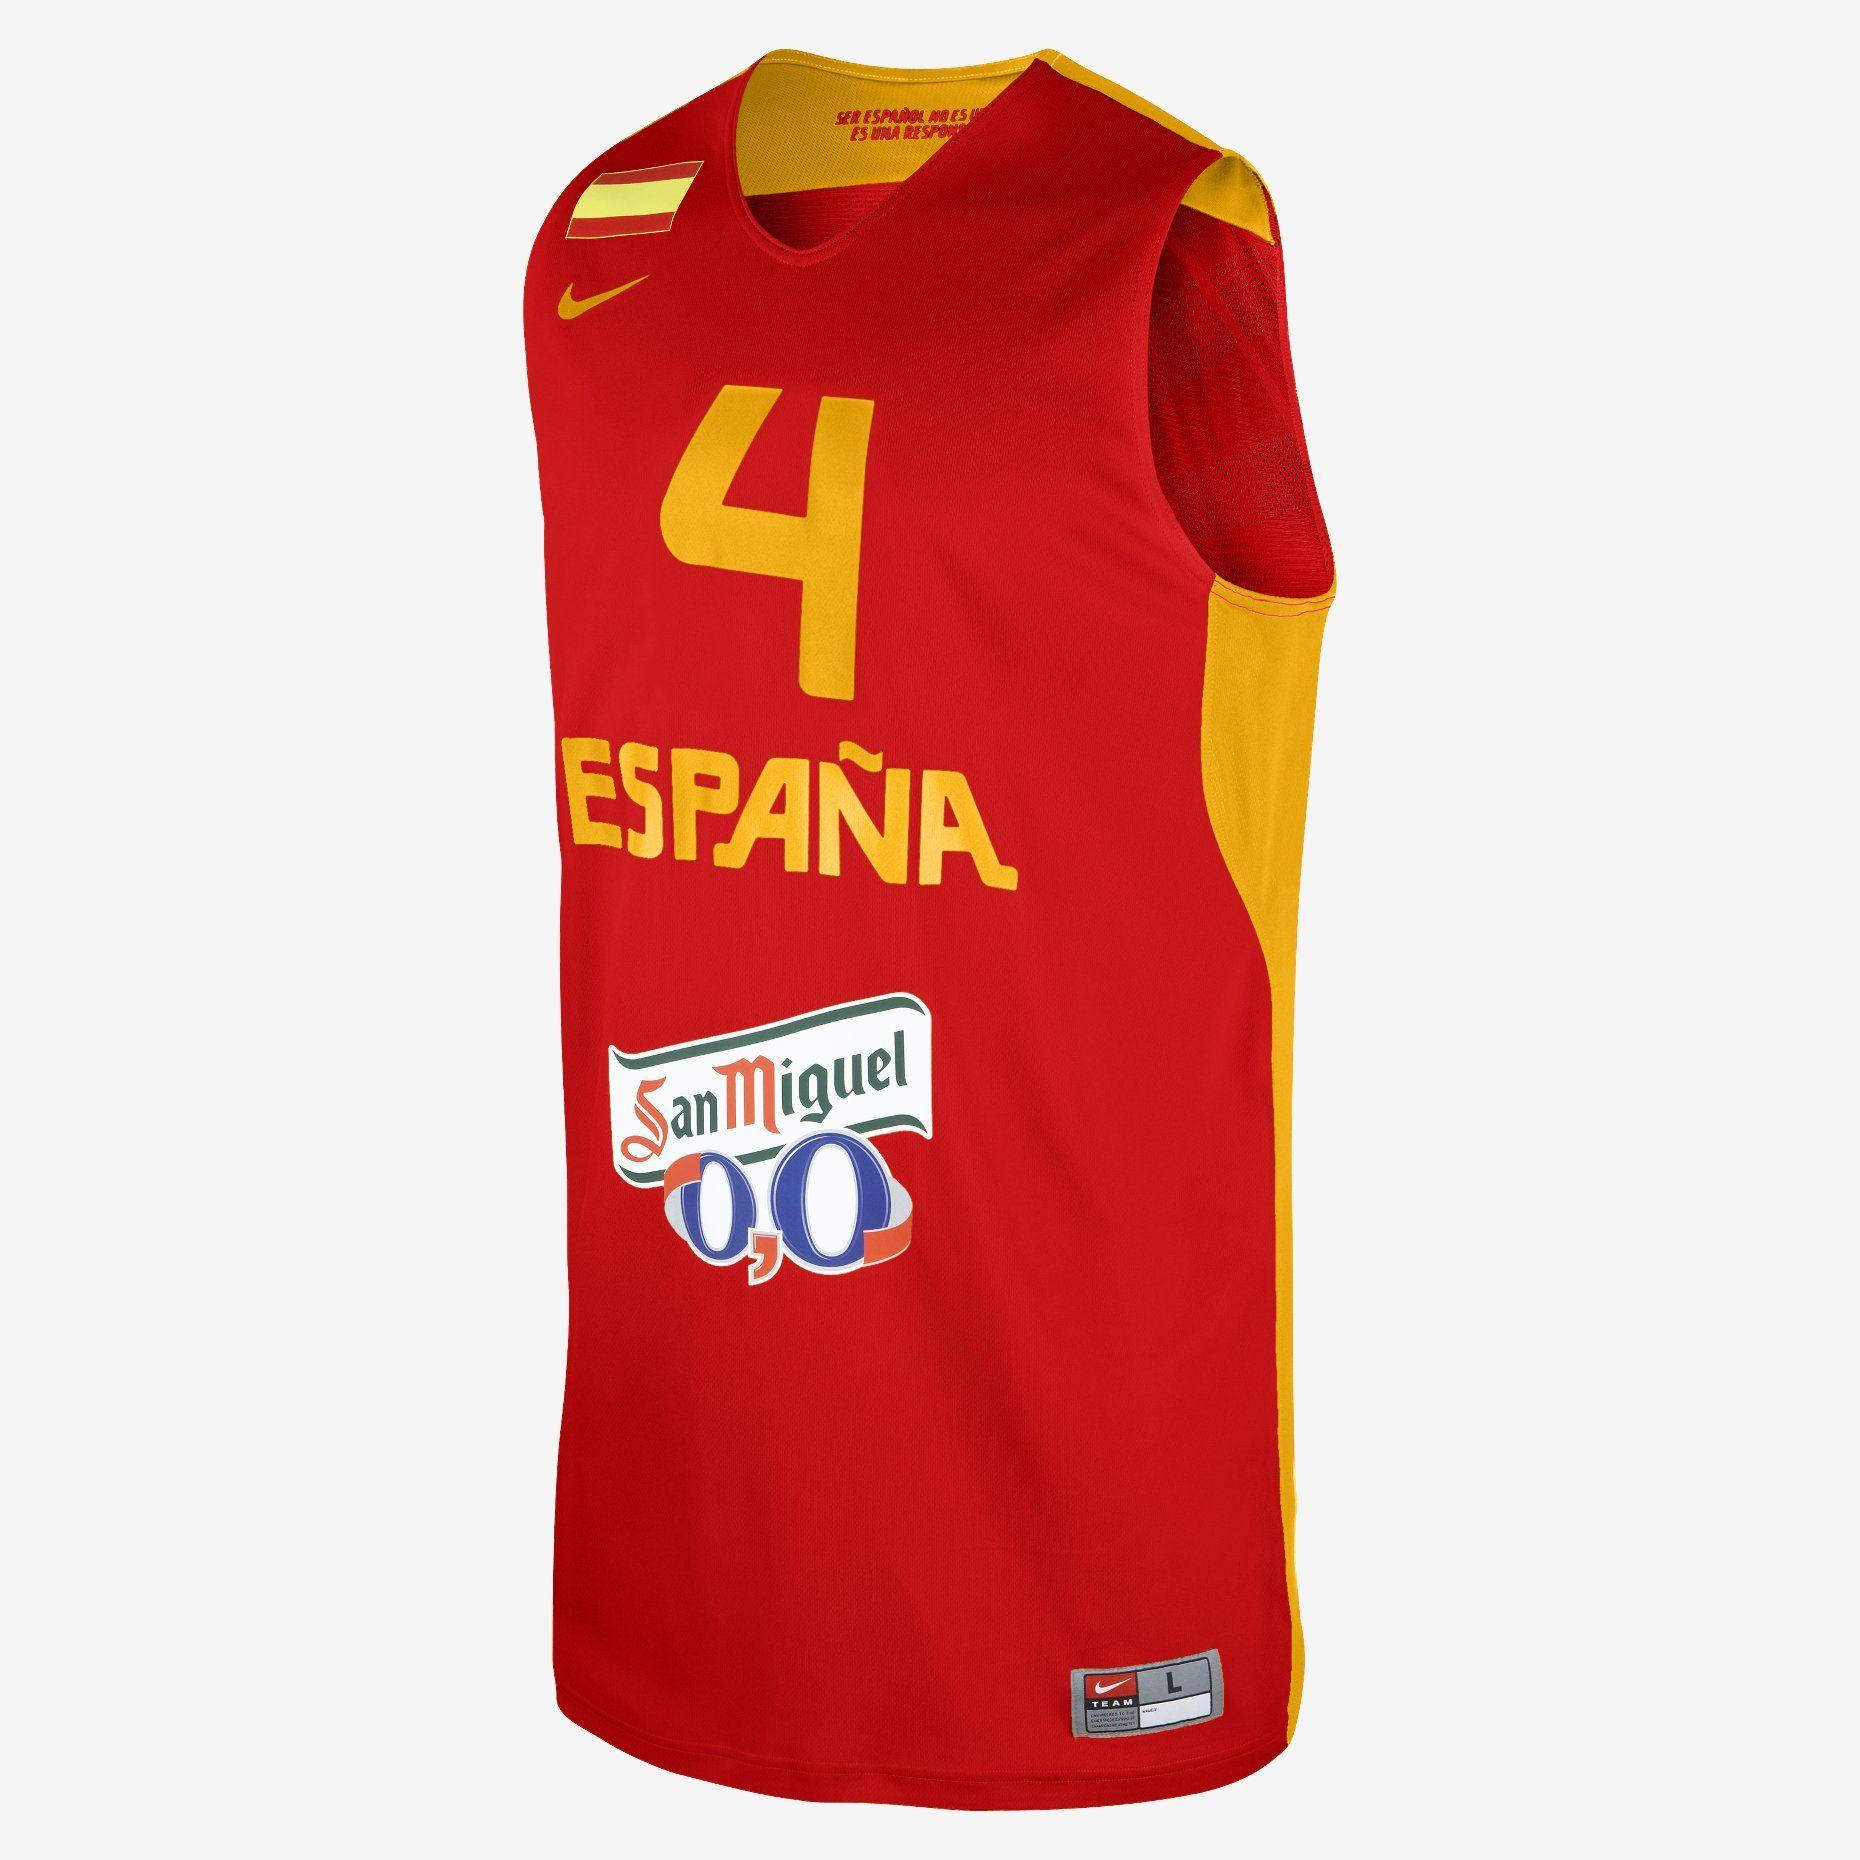 cualquier cosa Cooperación Illinois  Nike Store España. Nike Federation Replica (Spain) Camiseta de baloncesto -  Hombre | Sport outfits, Tops, Apparel